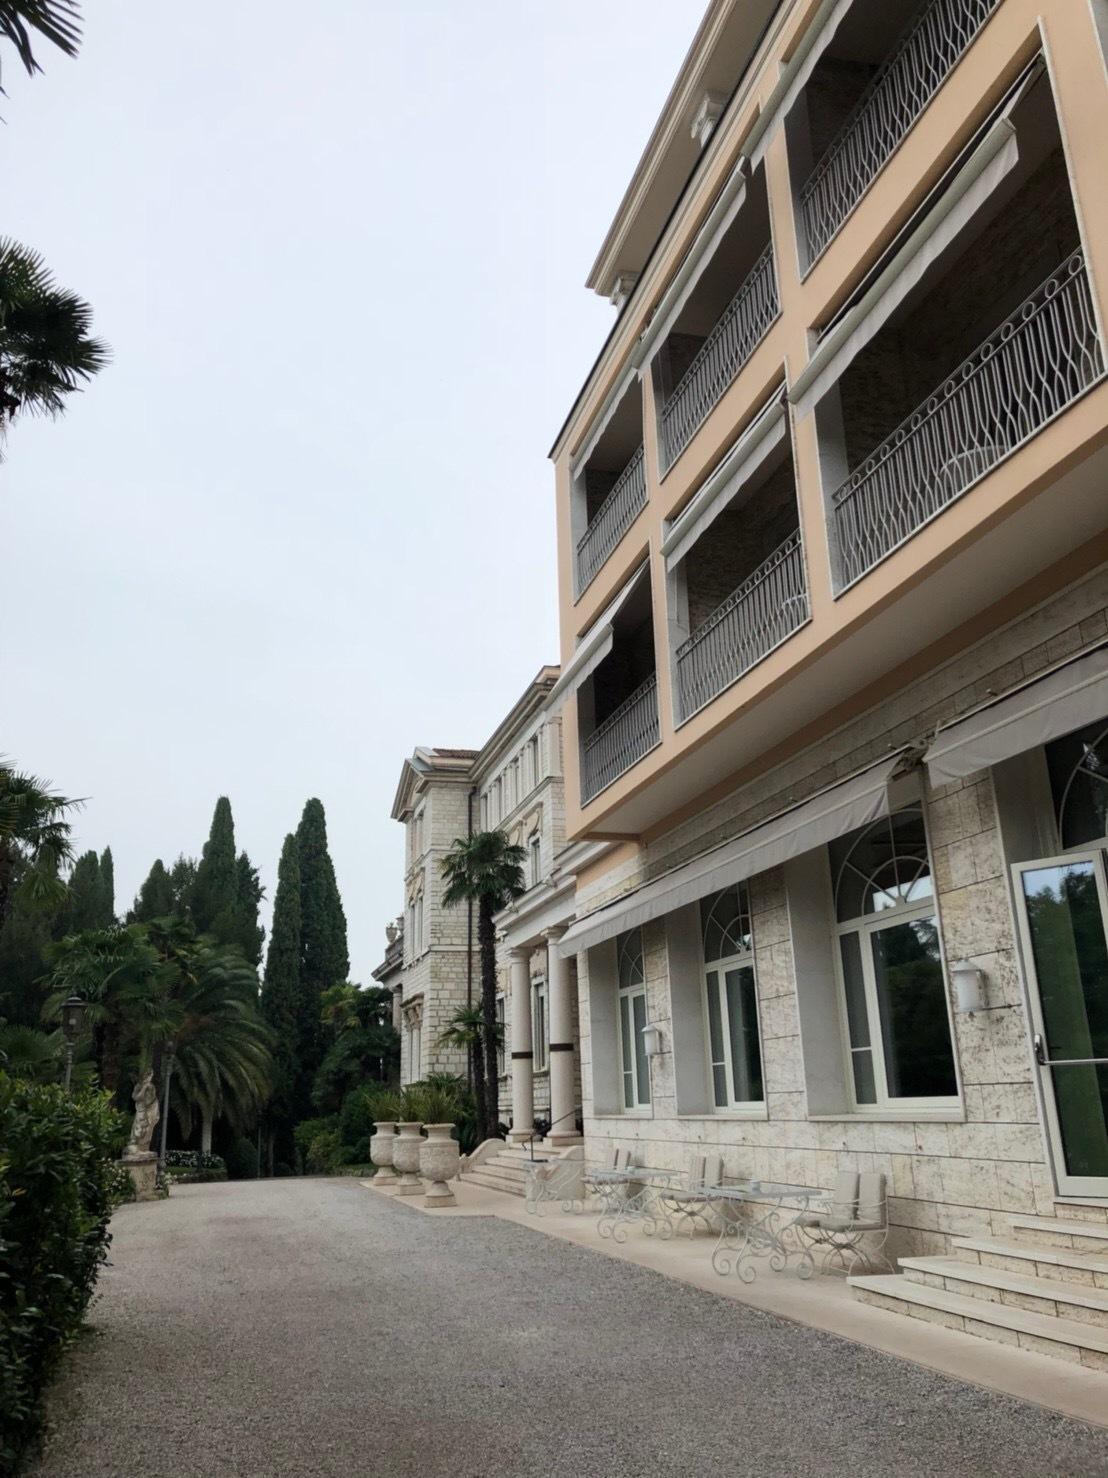 Villa cortine_a0129711_19432153.jpg